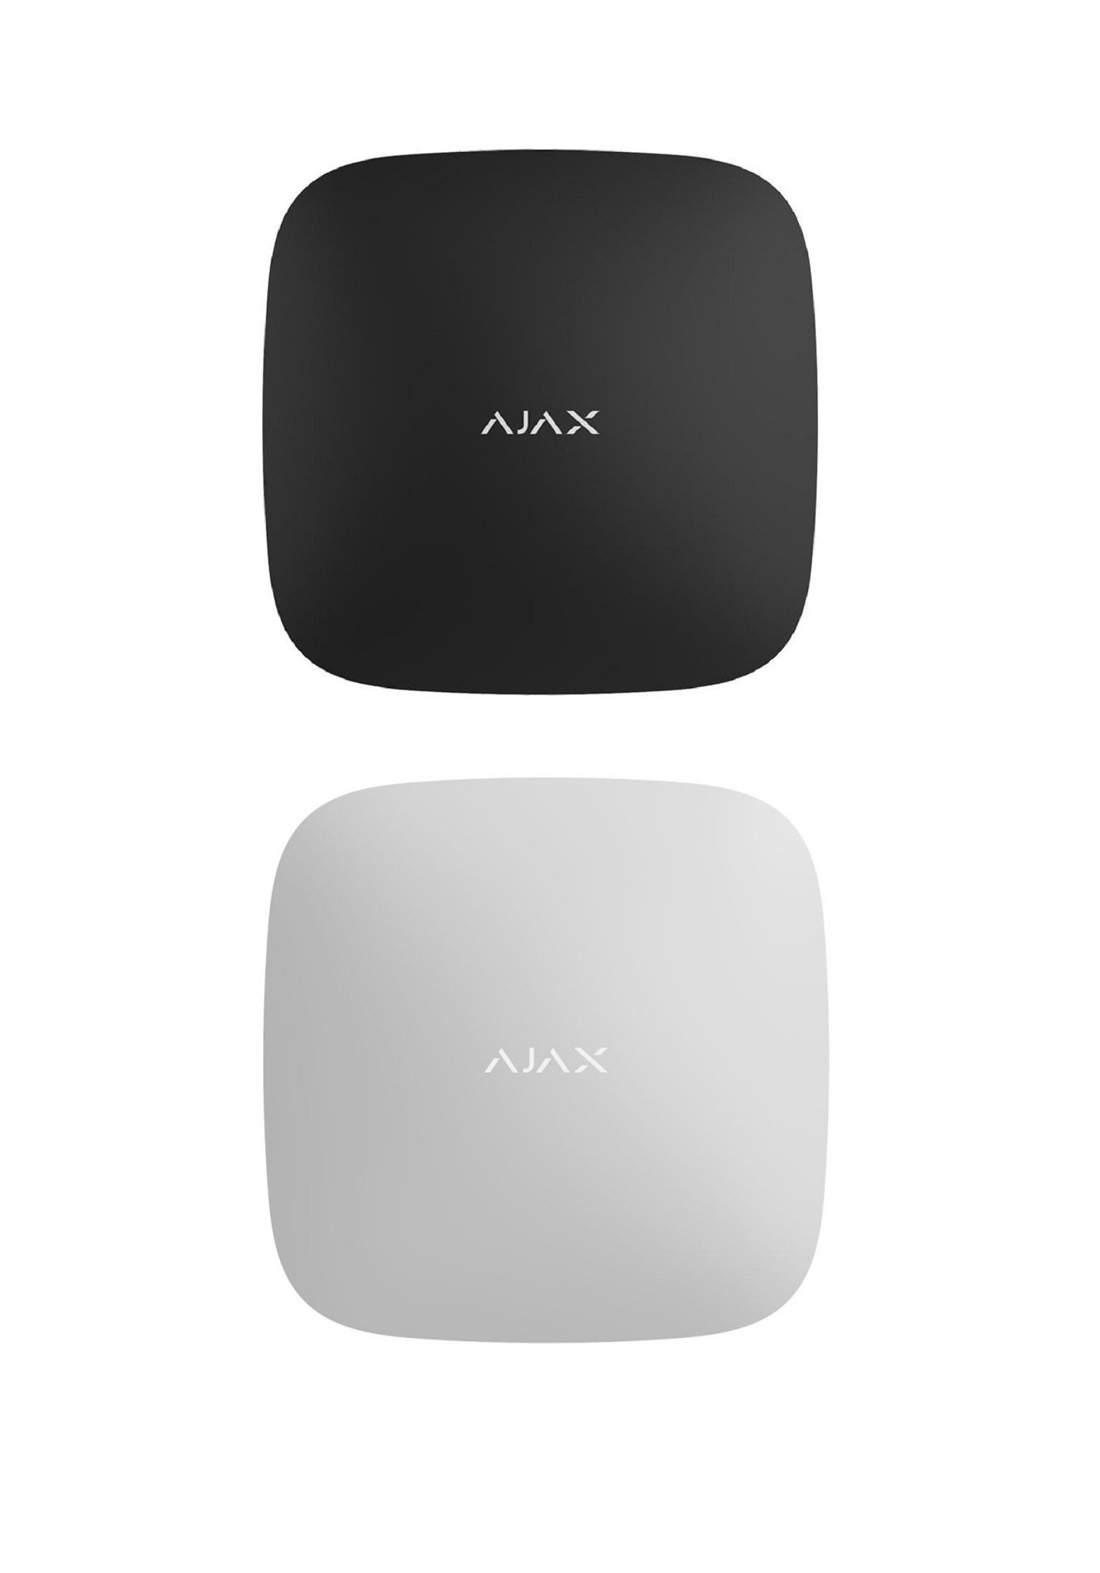 Ajax Fire Protect حساس لاسلكي داخلي كاشف للدخان والارتفاع السريع لدرجه الحرارة